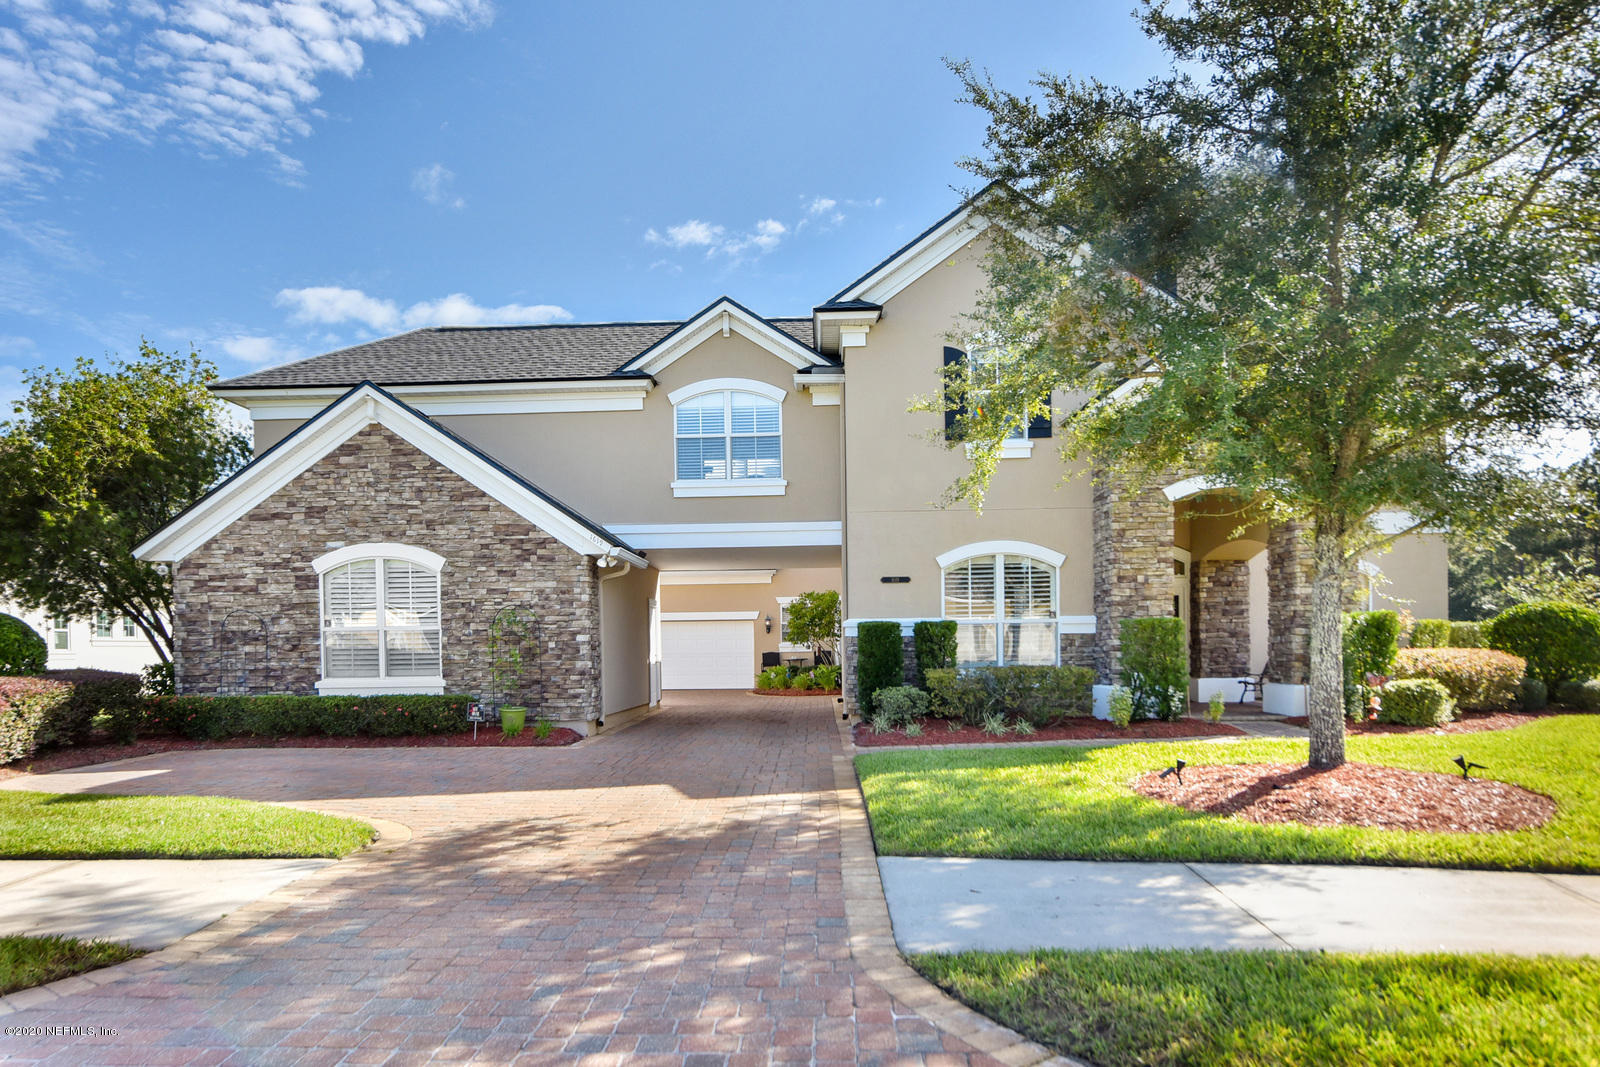 1619 CROOKED OAK, ORANGE PARK, FLORIDA 32065, 6 Bedrooms Bedrooms, ,4 BathroomsBathrooms,Residential,For sale,CROOKED OAK,1075025